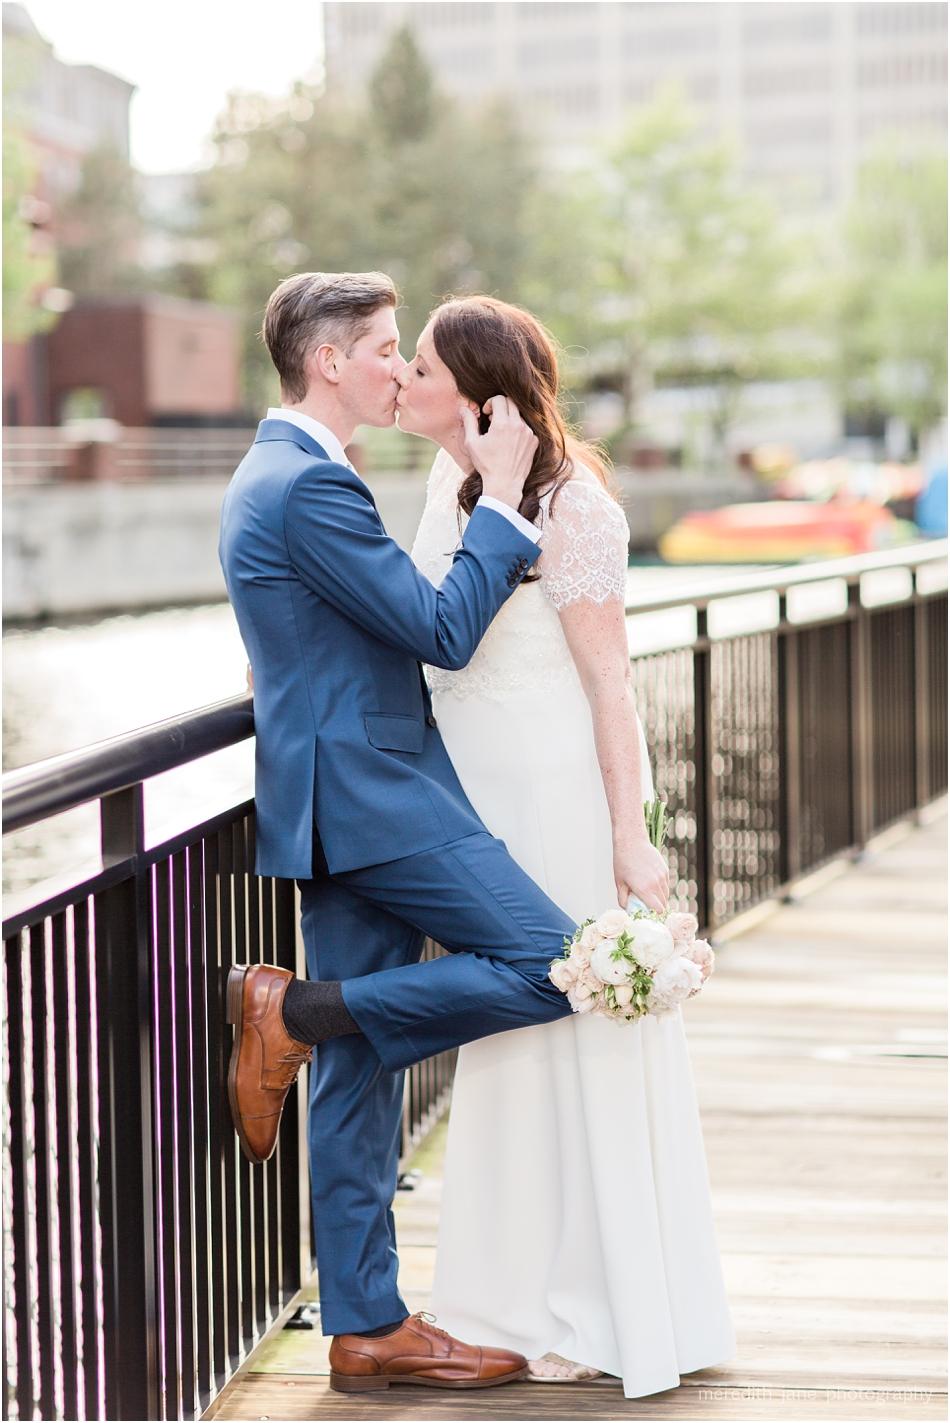 commonwealth_market_restaurant_roofdeck_ceremony_cambridge_boston_massachusetts_cape_cod_new_england_wedding_photographer_Meredith_Jane_Photography_photo_1351.jpg